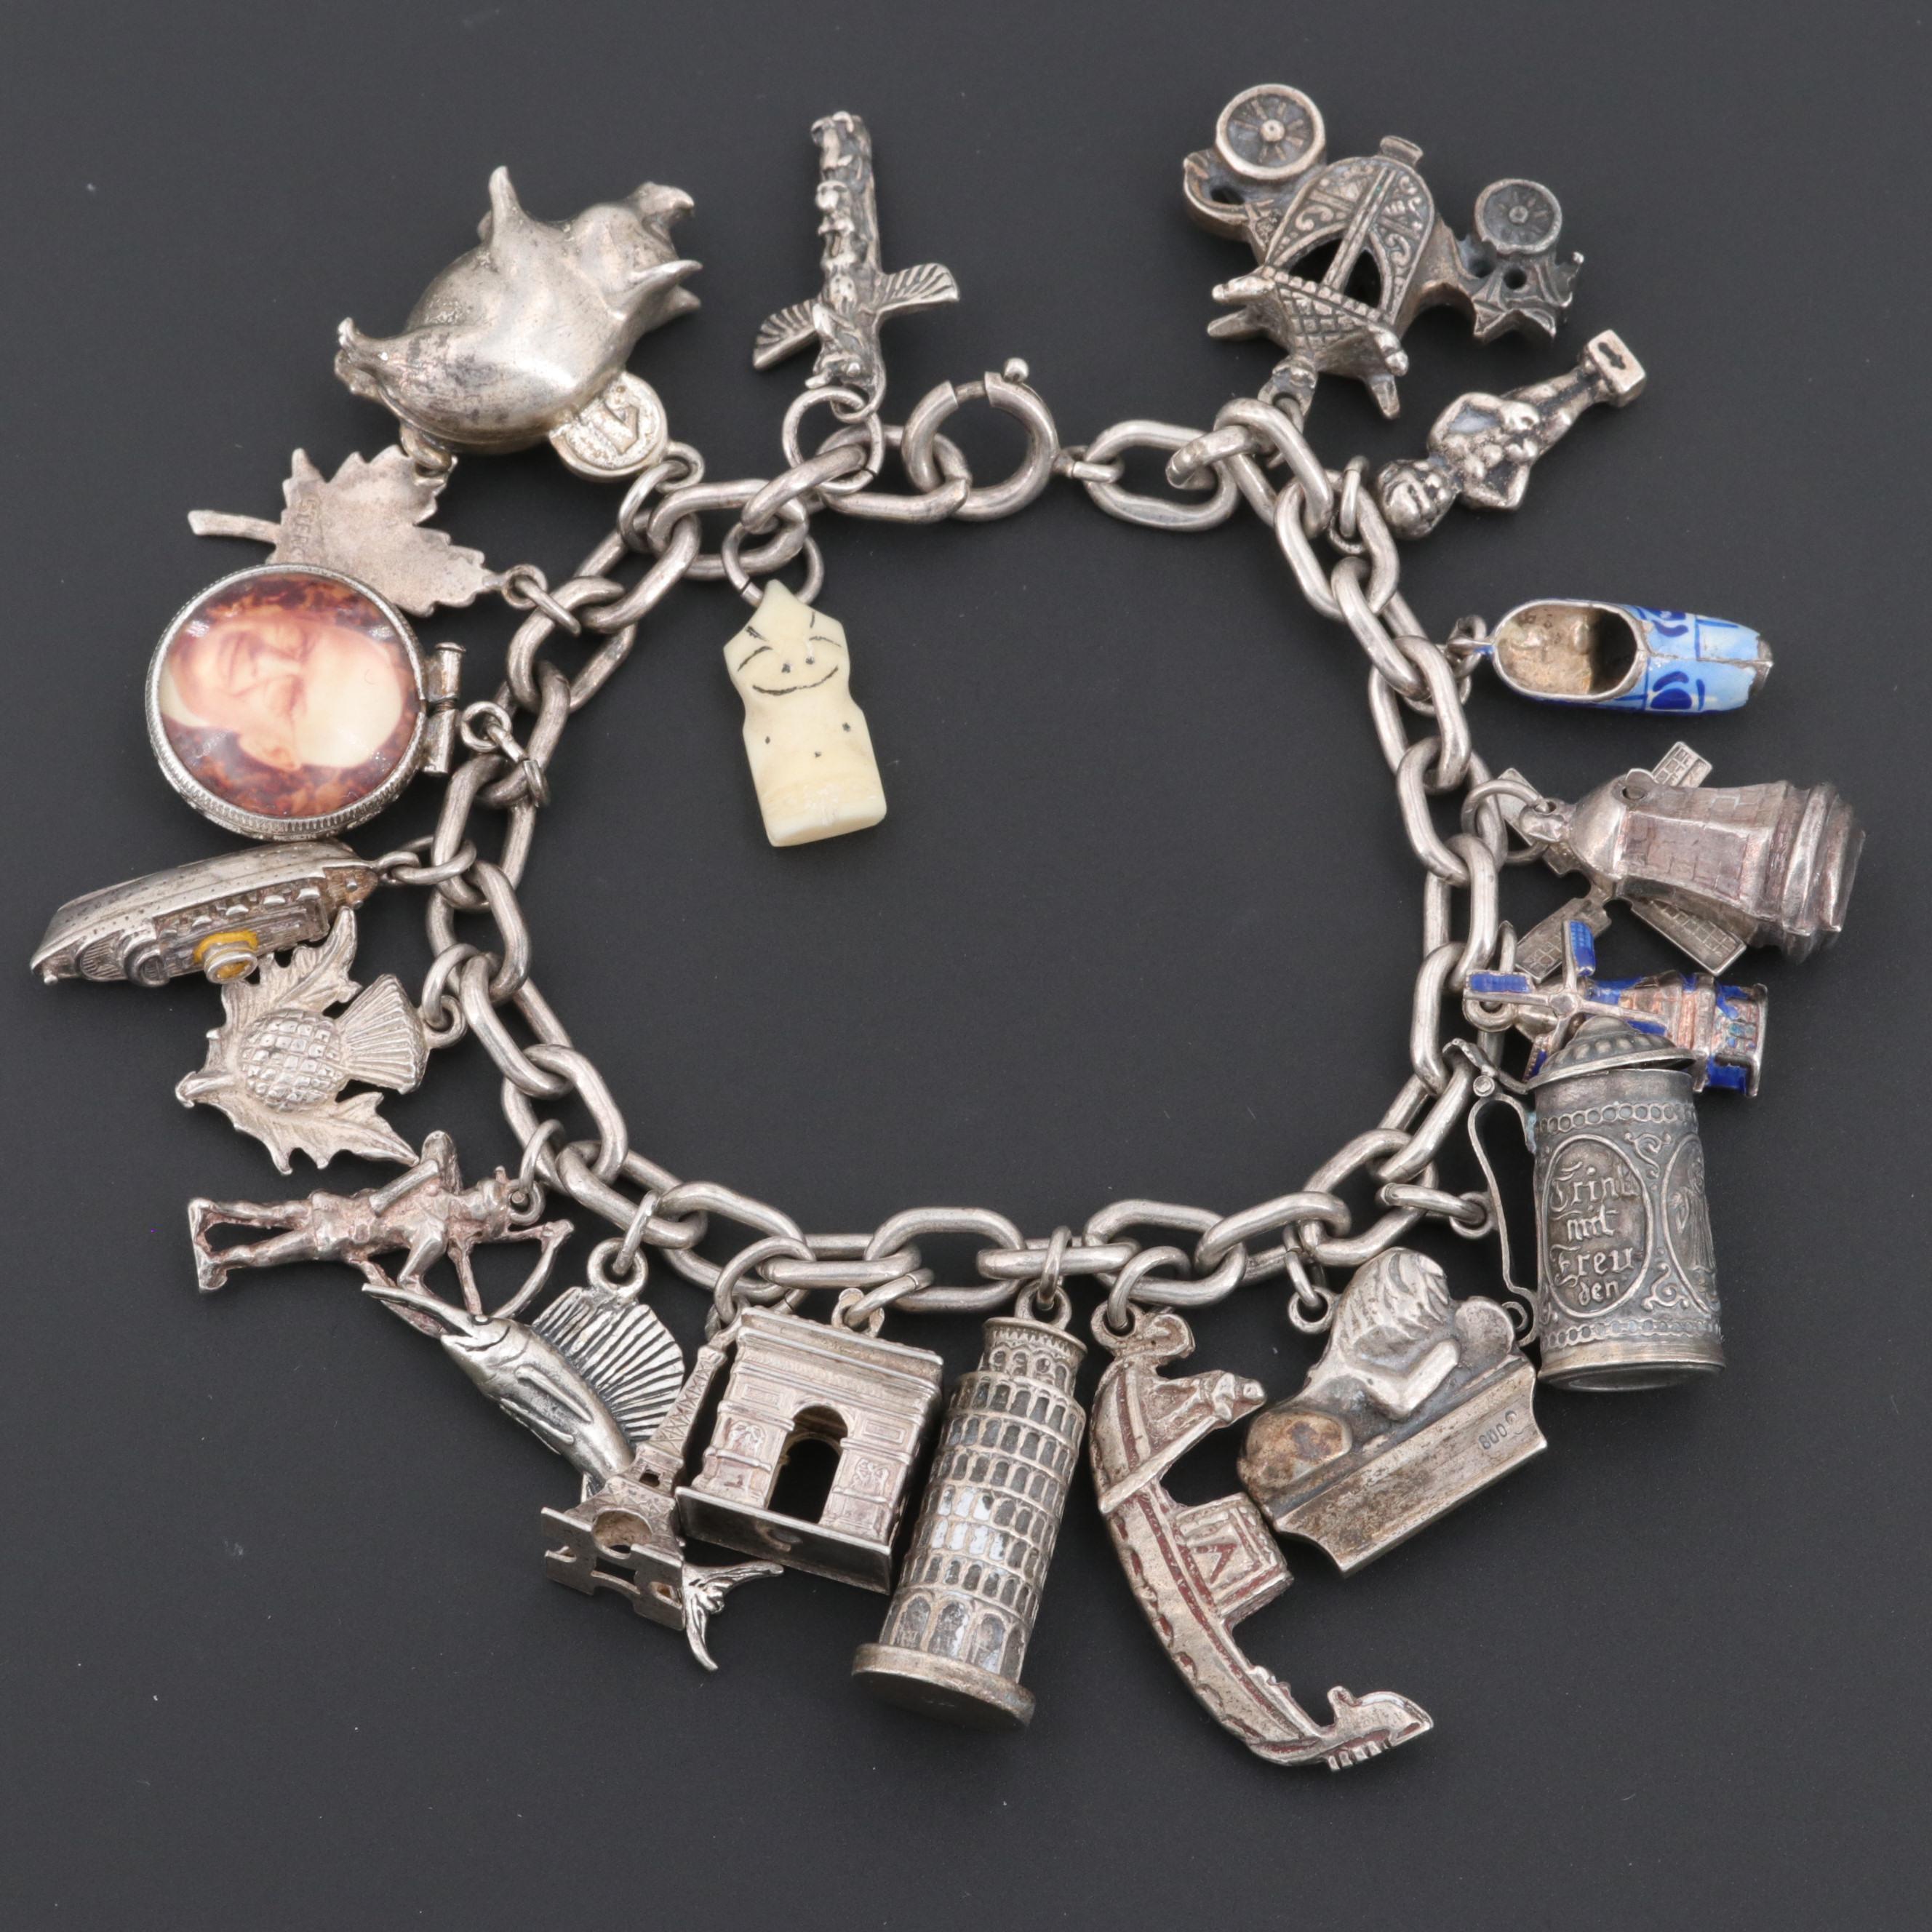 Vintage Silver Tourist Charm Bracelet Including Billiken Charm